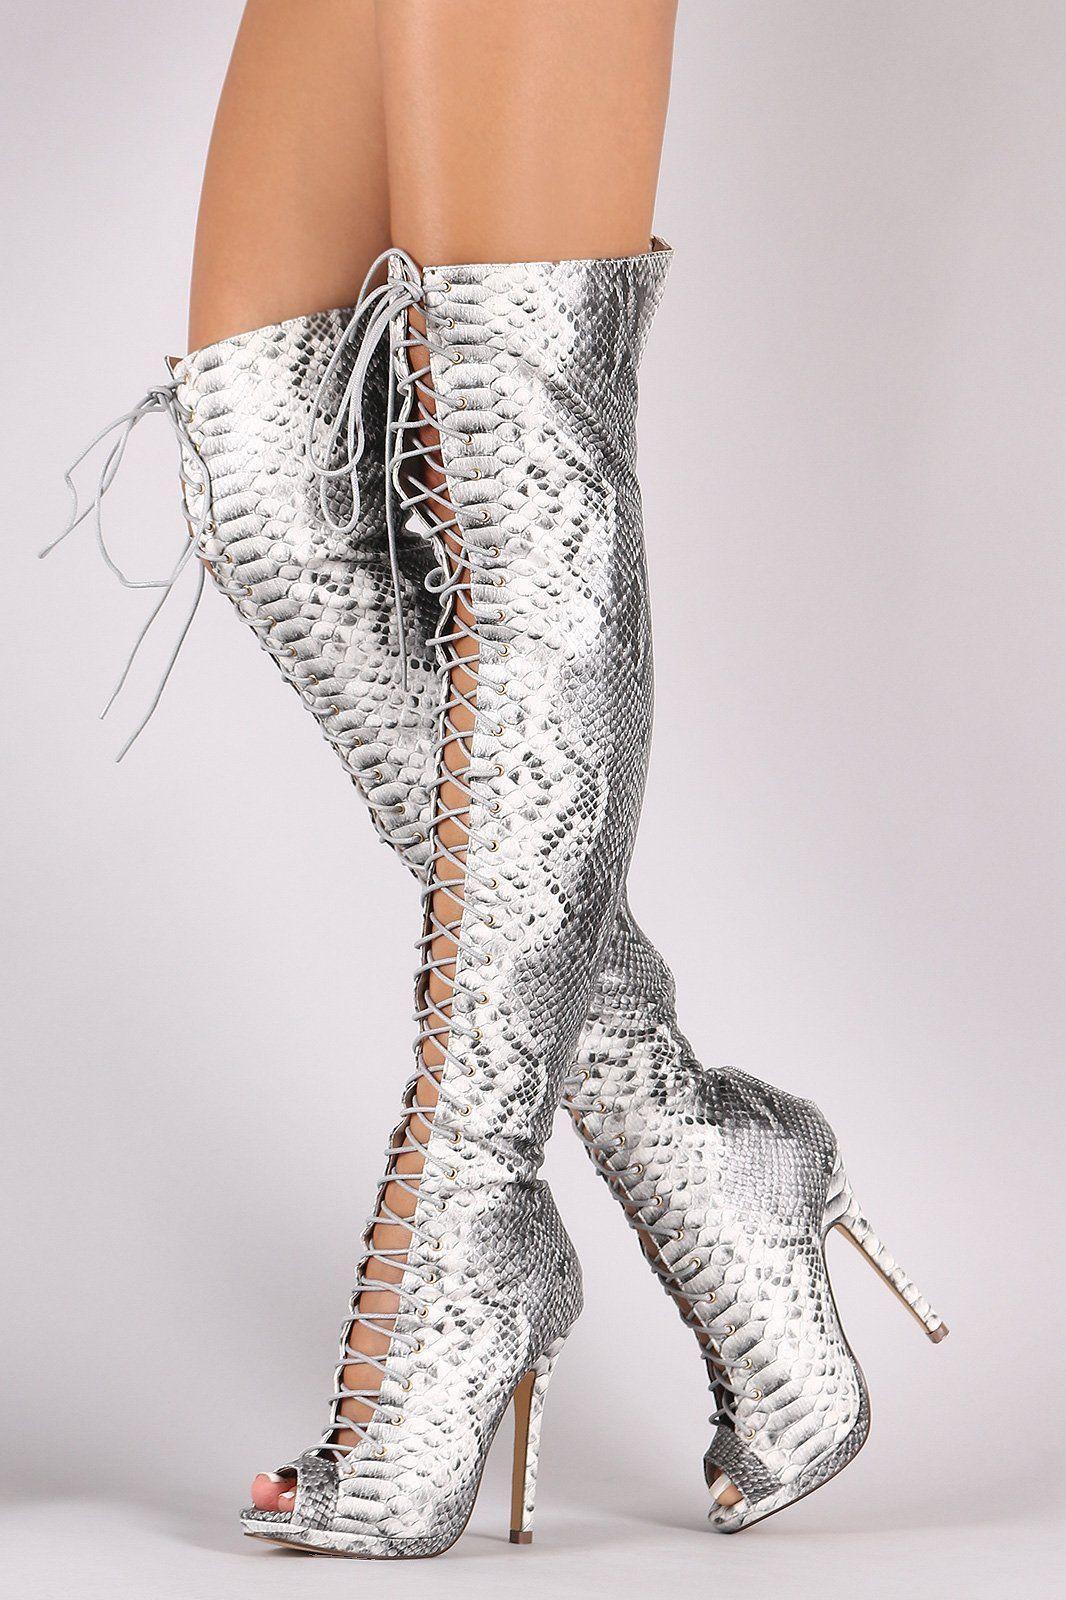 dba5329ddb5 Liliana Python Lace Up Stiletto Heeled Over-The-Knee Boots   stilettoheelsboots  goldstilettoheels